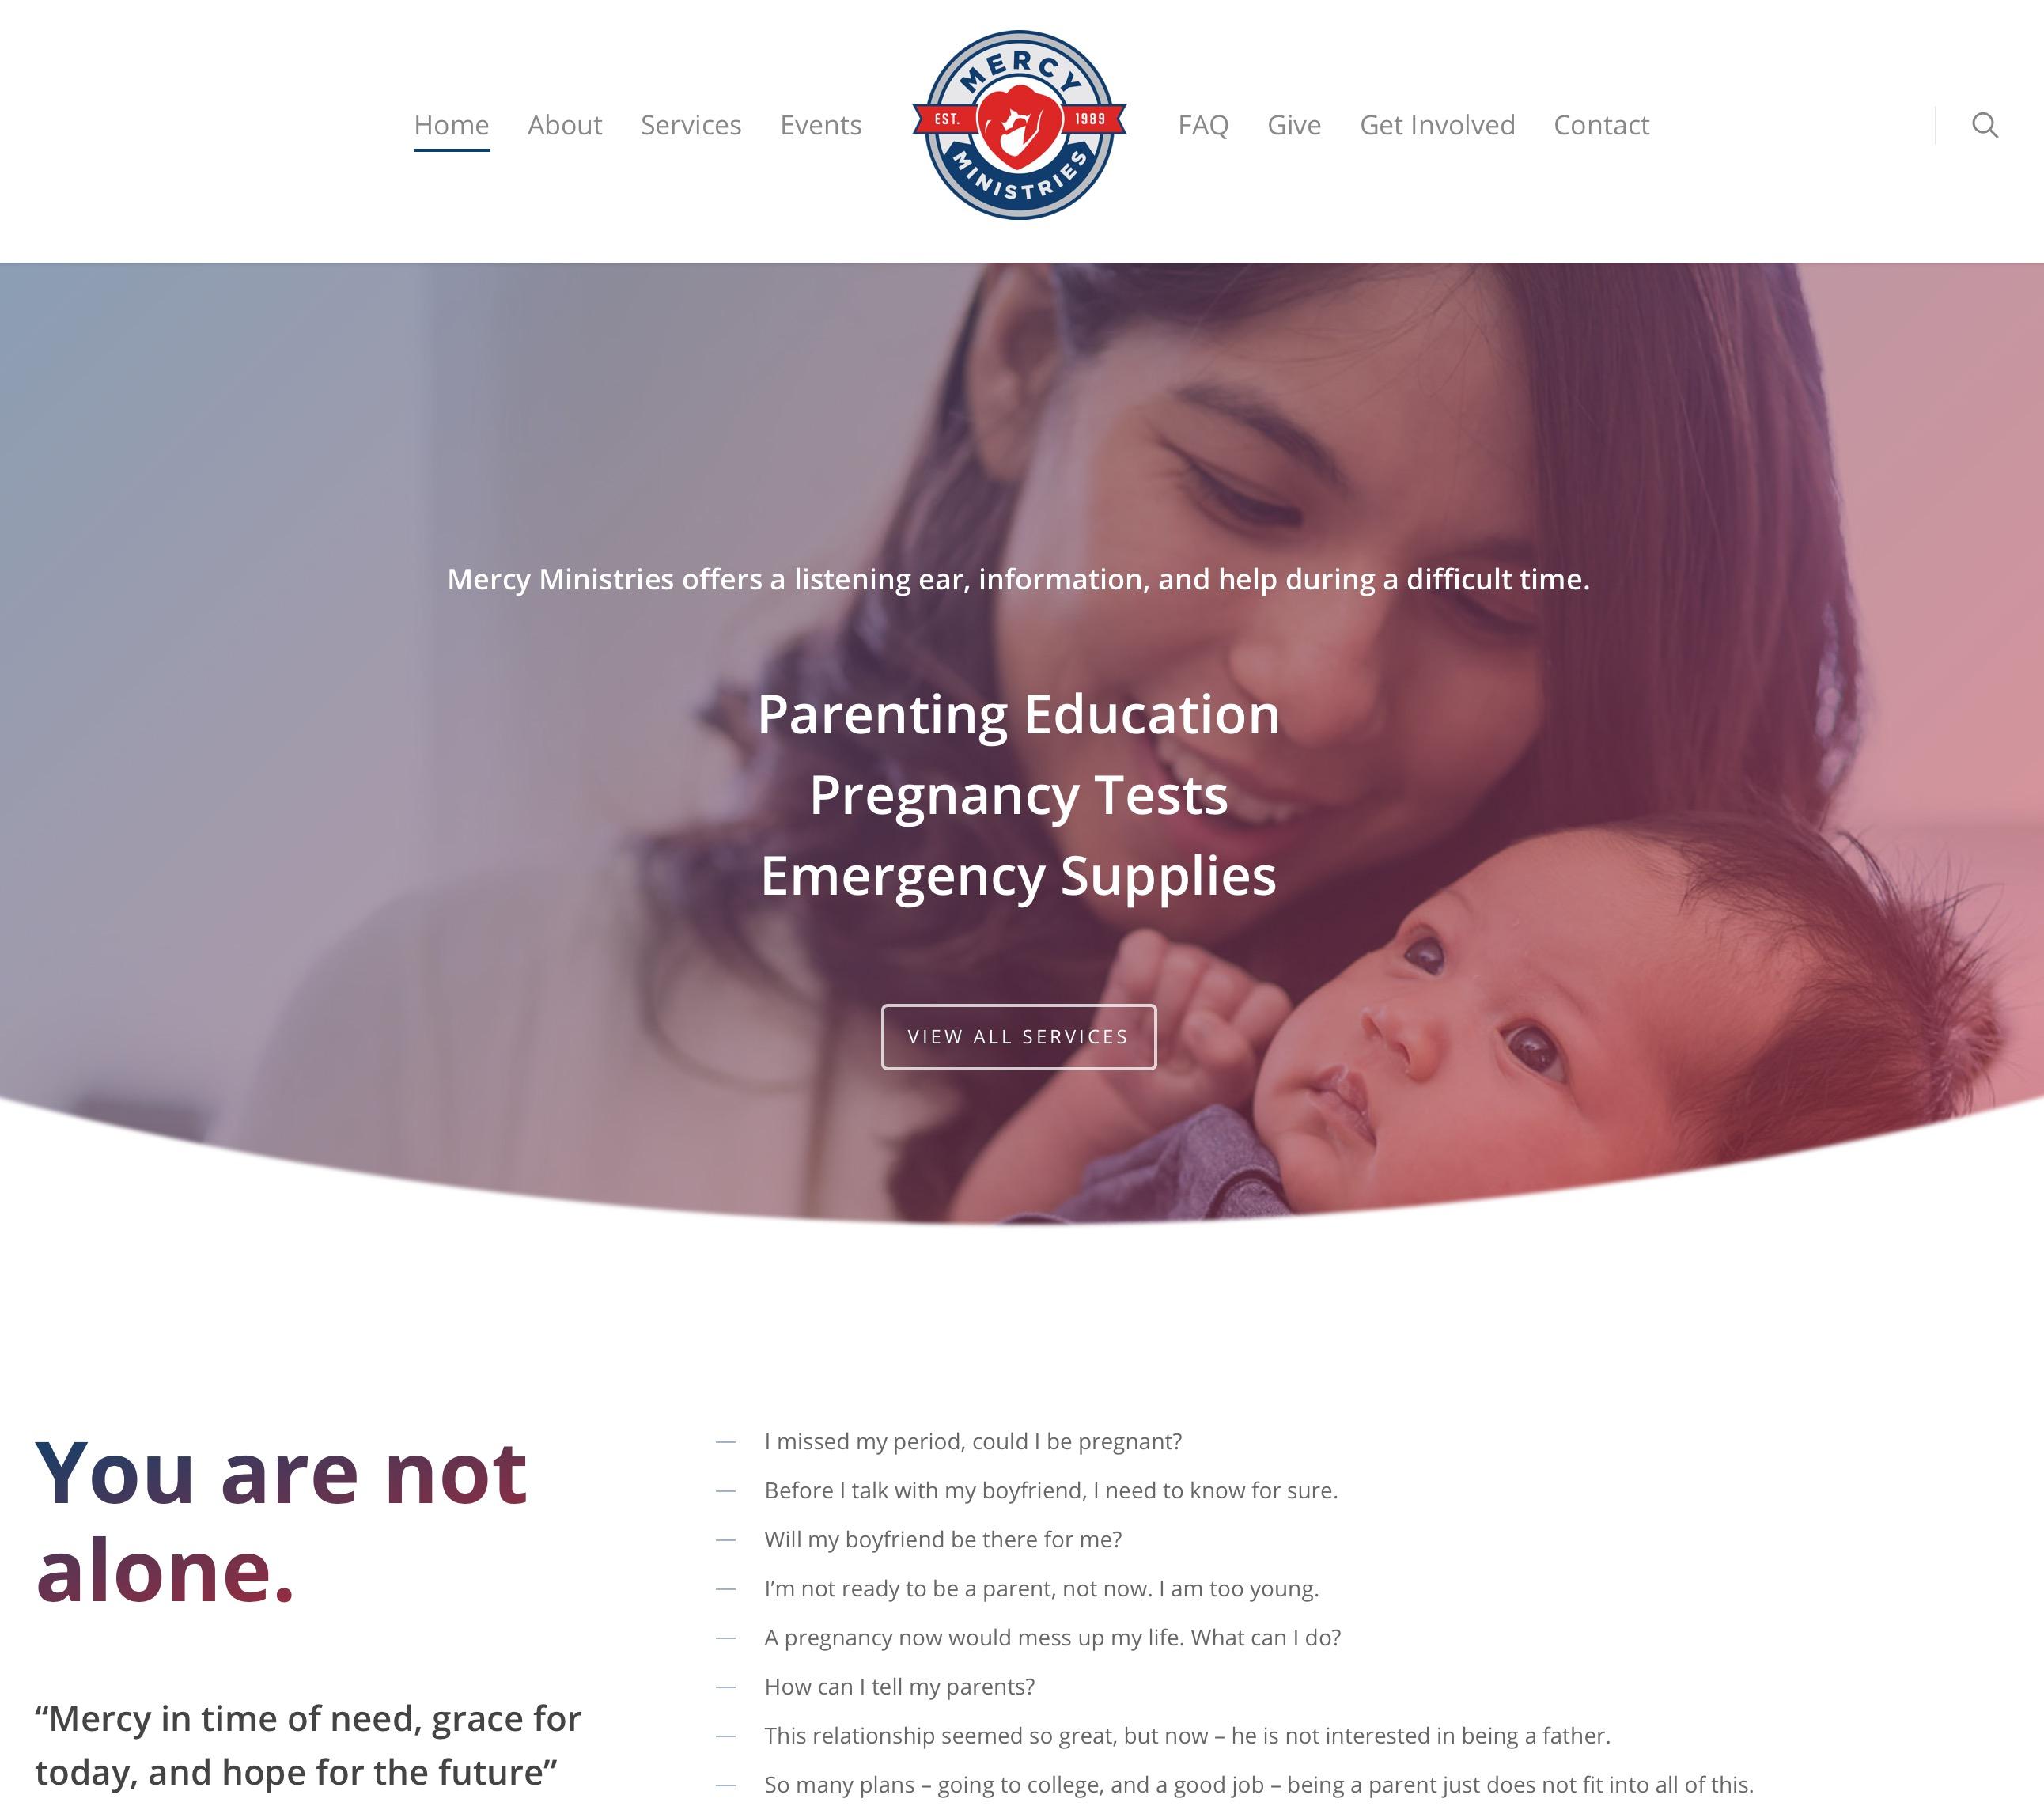 (c) Mercypregnancycenter.org